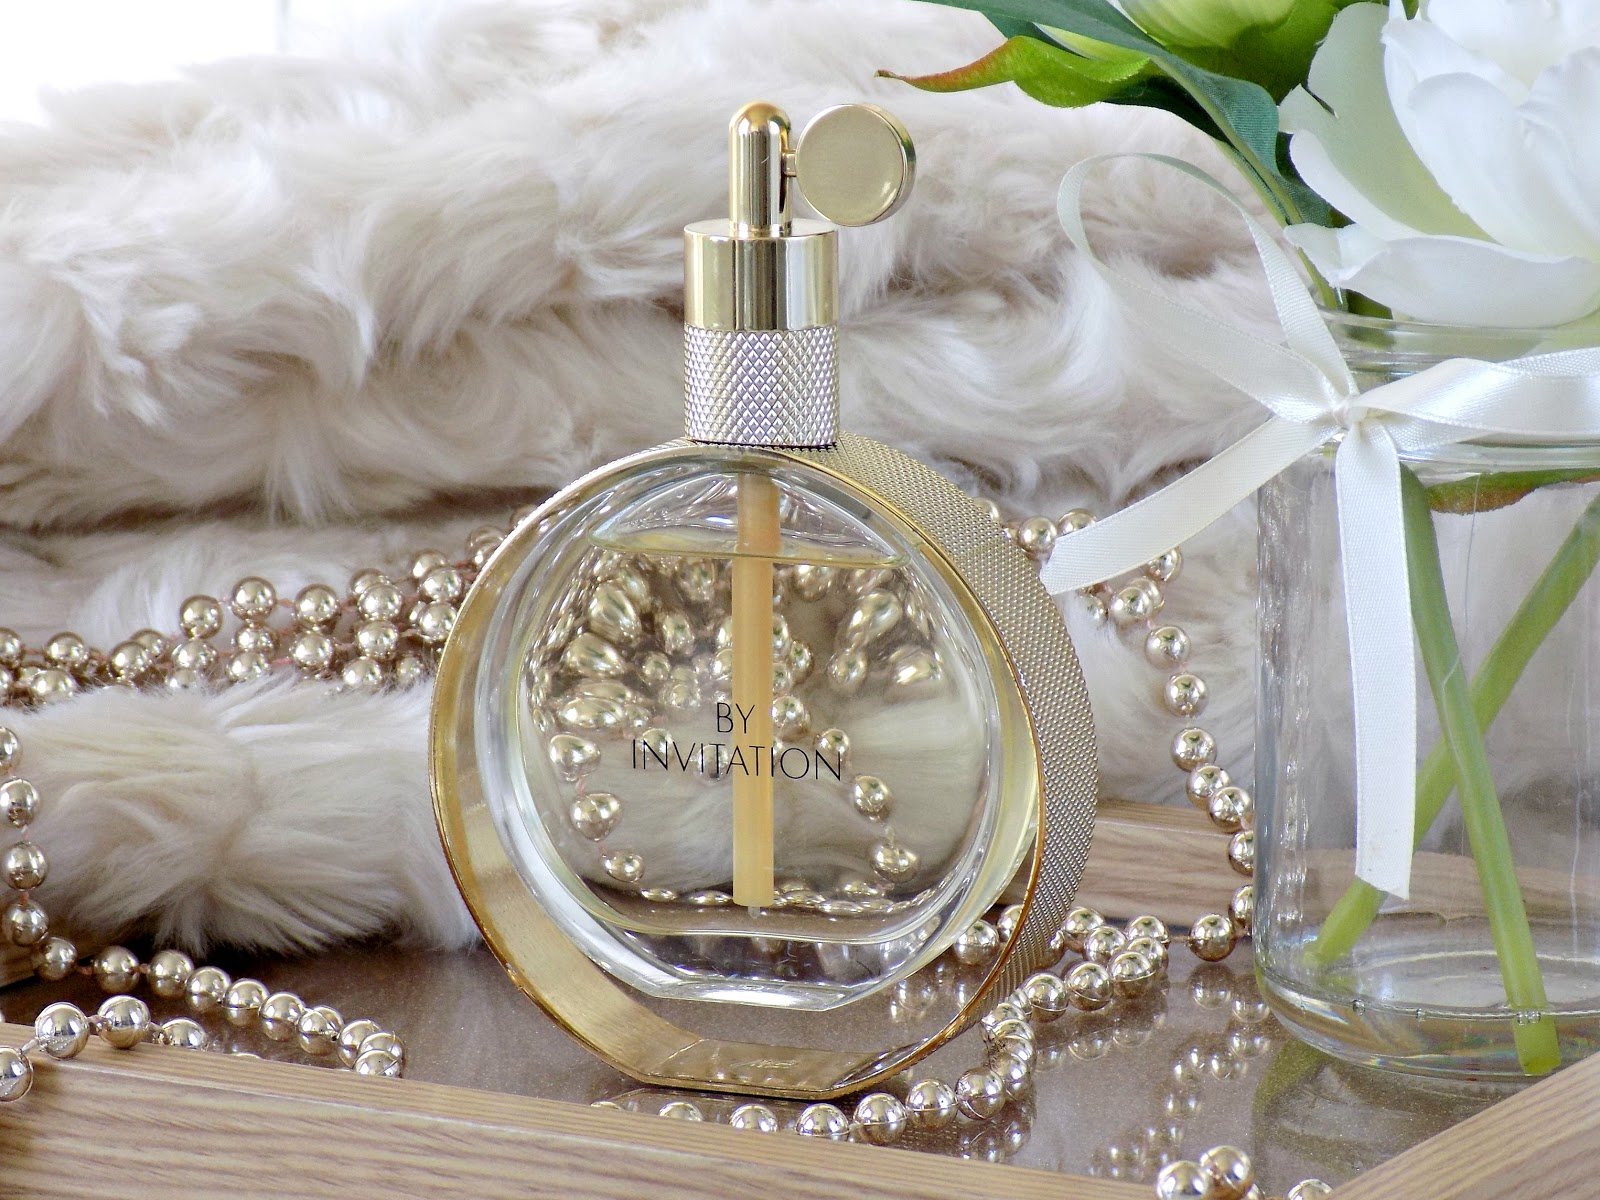 Michael Buble By Invitation perfume